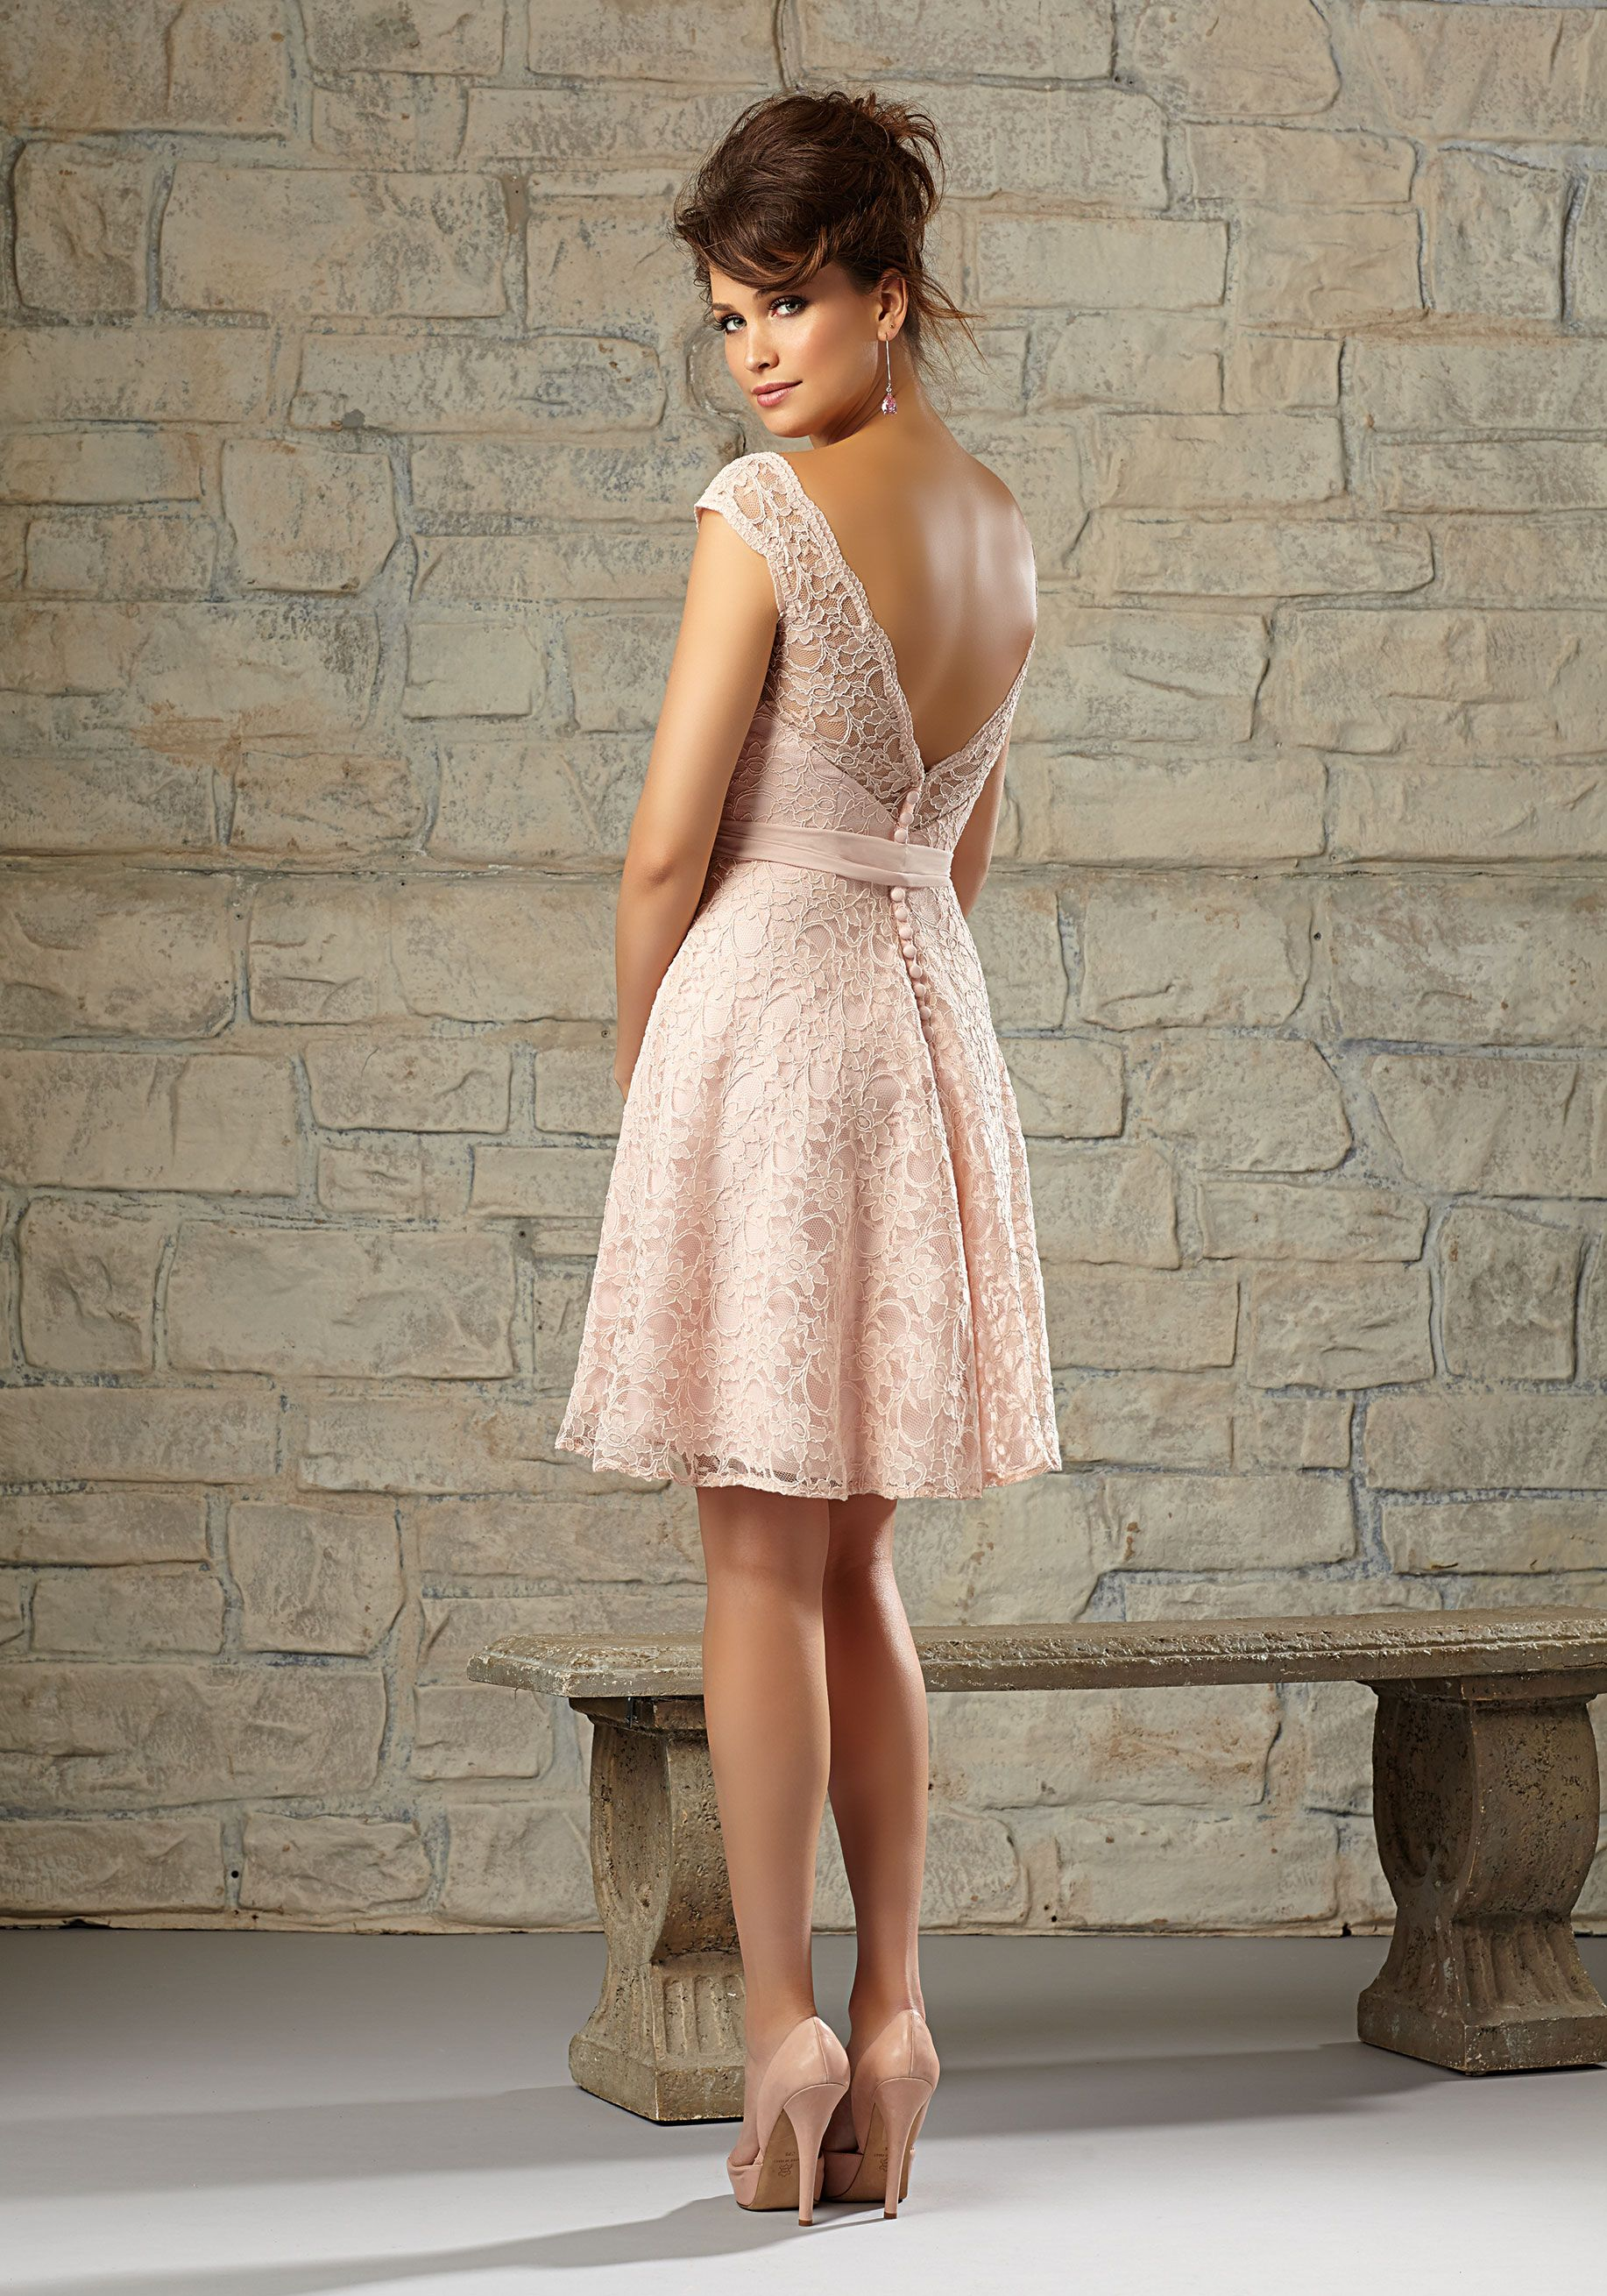 Romantic Knee Length Lace Bridesmaid Dress Designed By Madeline Gardner Zipper Back Pink Bridesmaid Dresses Short Short Bridesmaid Dresses Bridesmaid Dresses